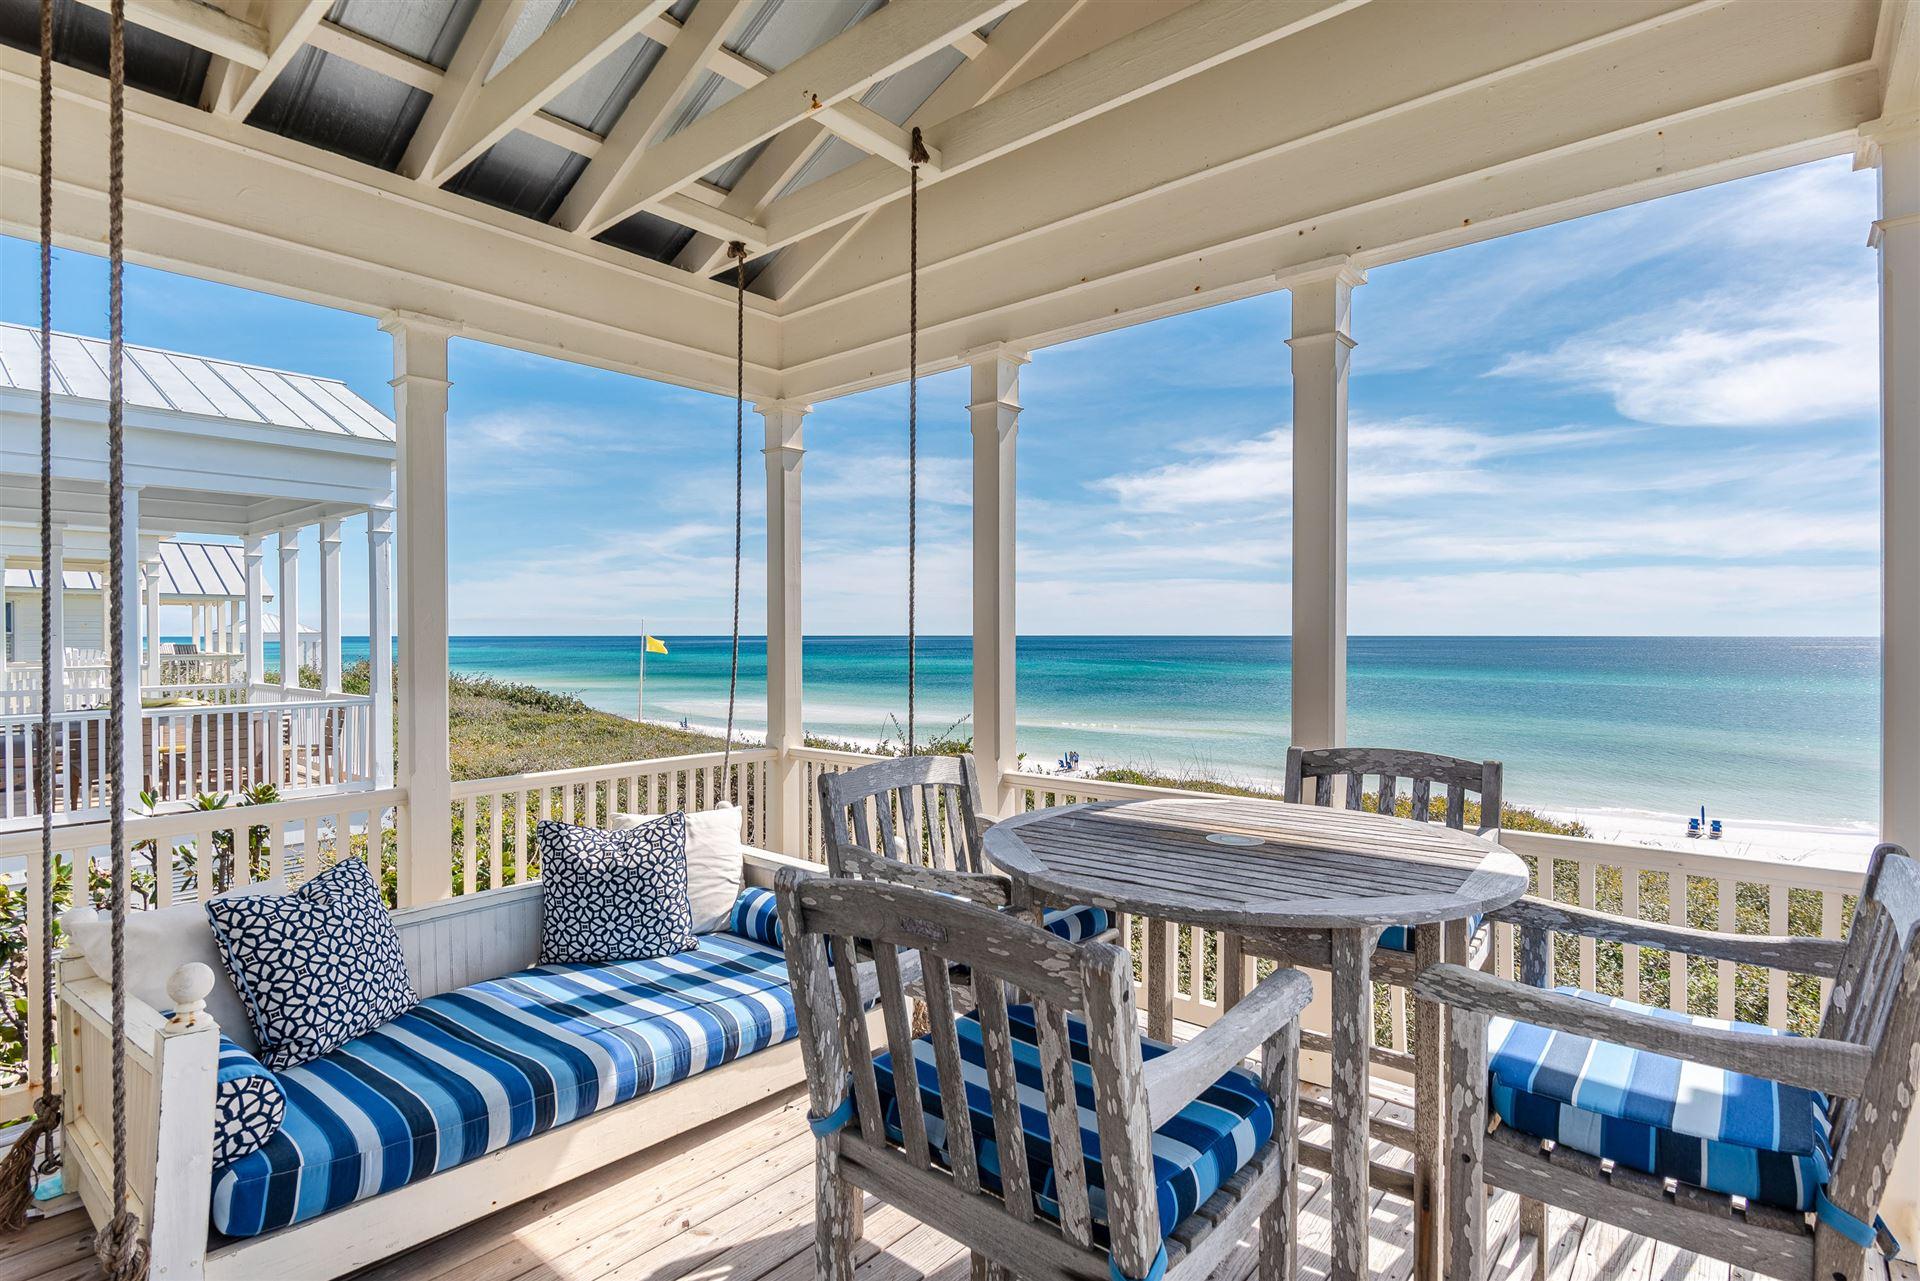 Property Image Of 2352 E County Hwy 30A In Santa Rosa Beach, Fl